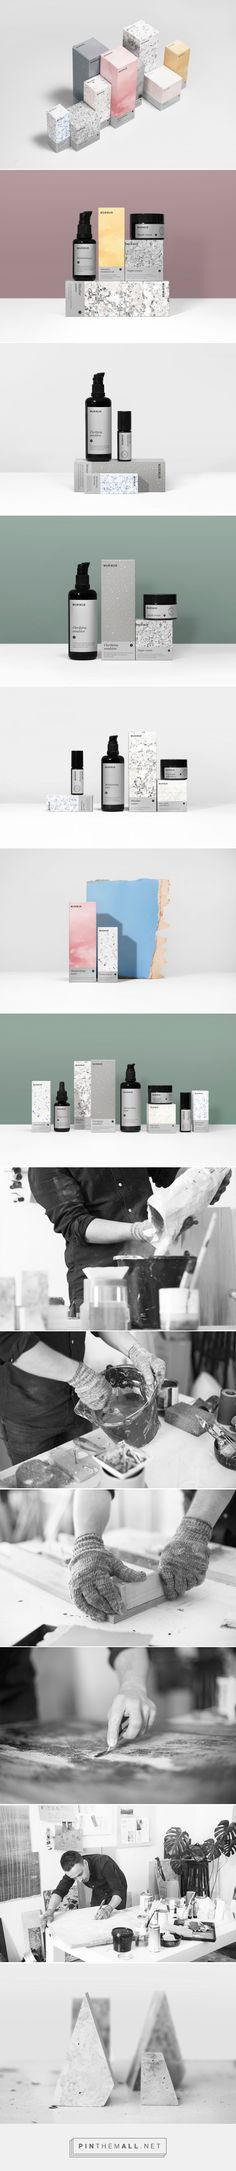 MURMUR - Packaging of the World - Creative Package Design Gallery - http://www.packagingoftheworld.com/2016/07/murmur.html